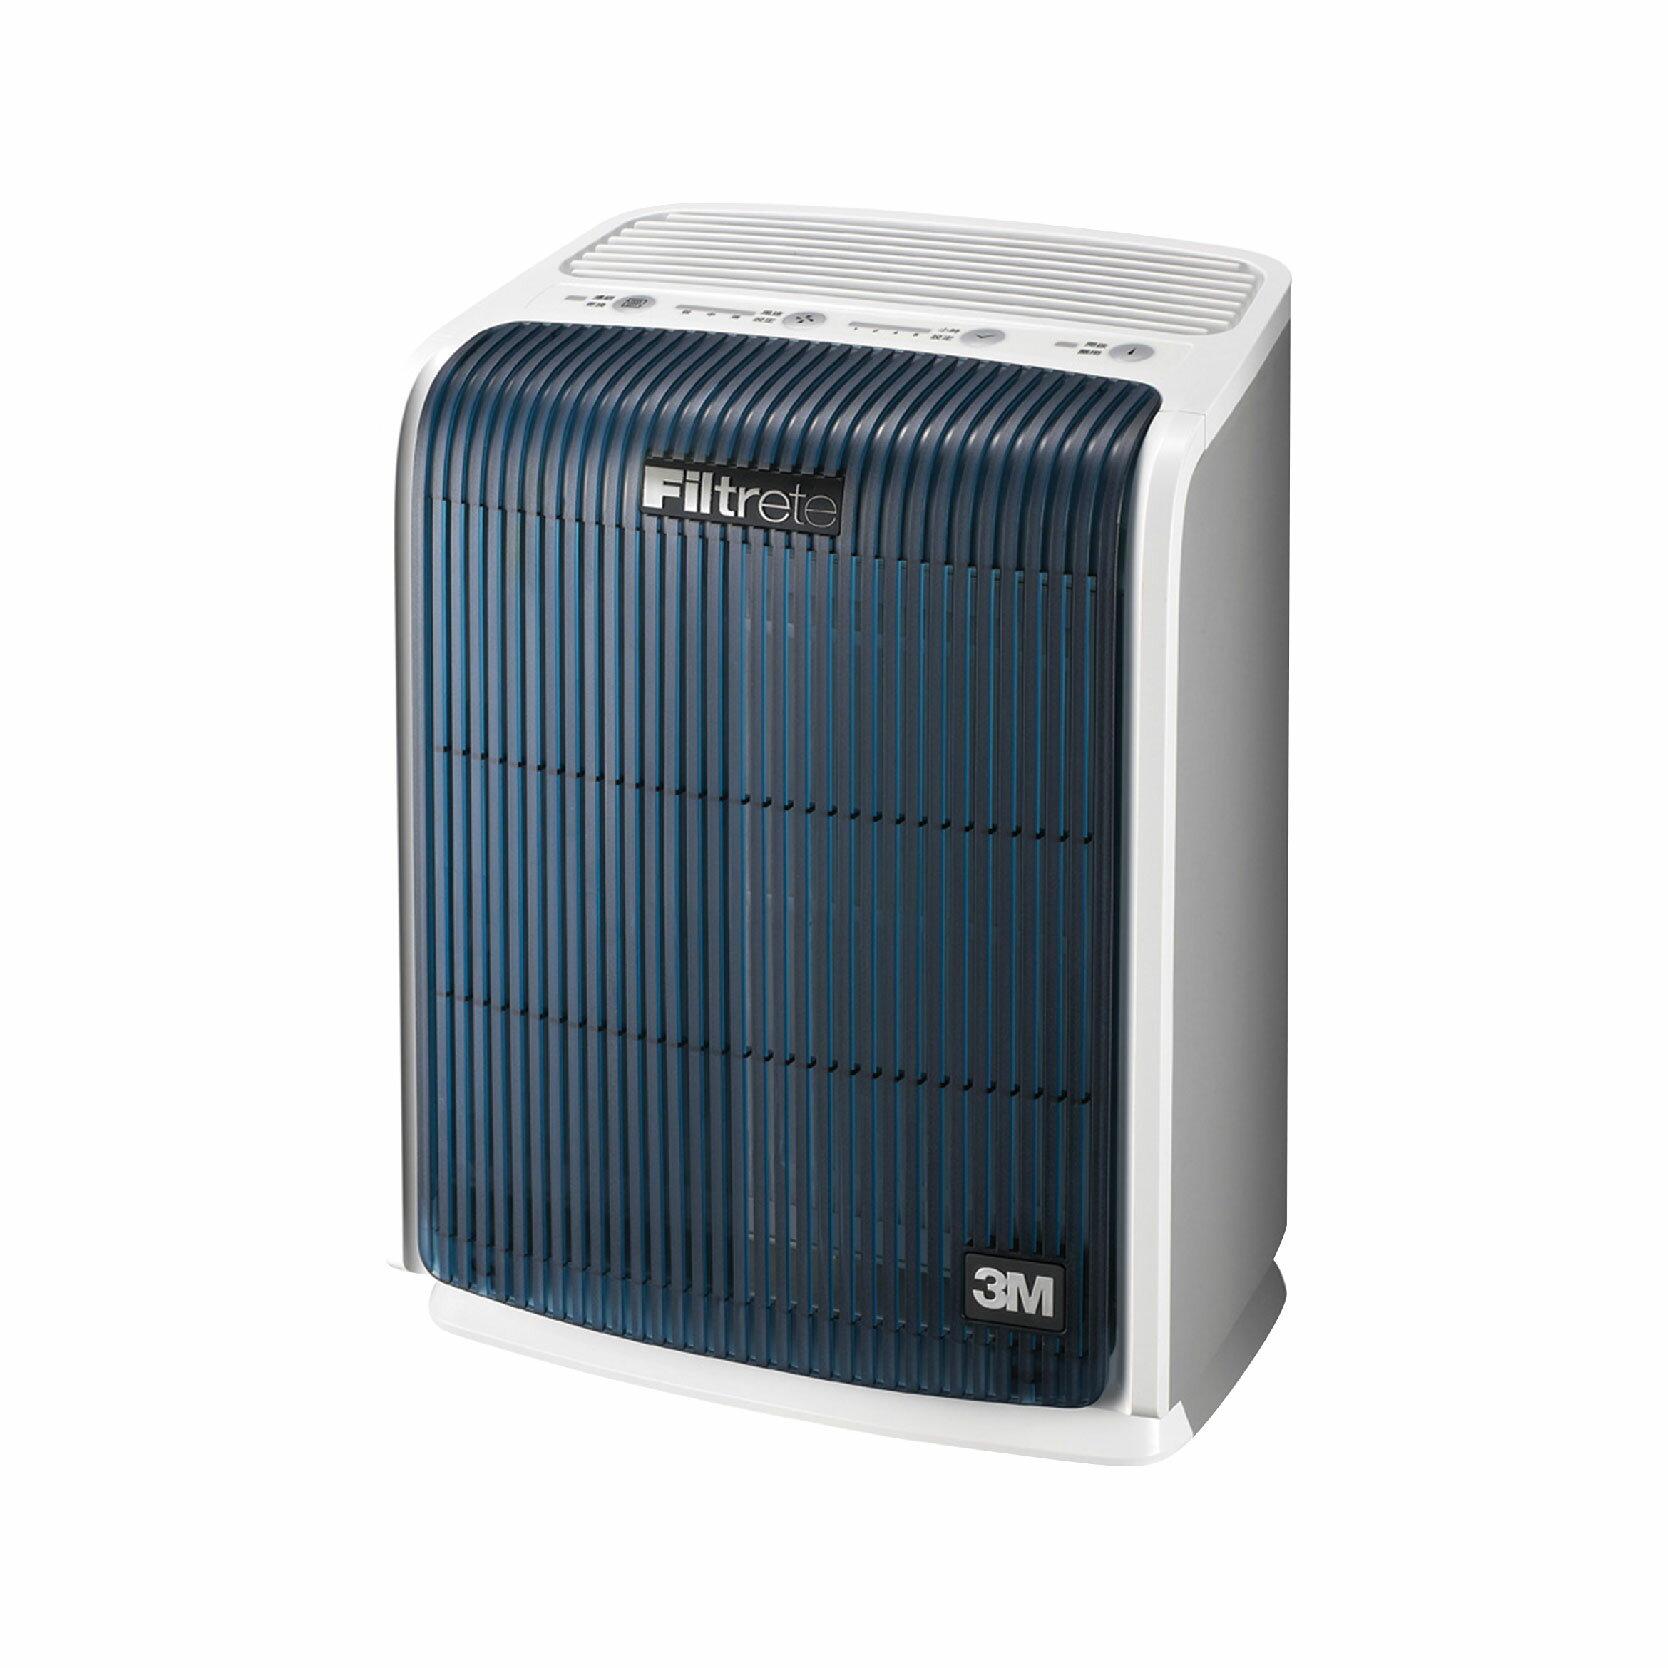 3M 淨呼吸 極淨型空氣清淨機 FA-T10AB 除臭 除菌 吸附灰塵 空氣清淨機 強效過濾 除去過敏原 活性碳濾網 負離子清淨